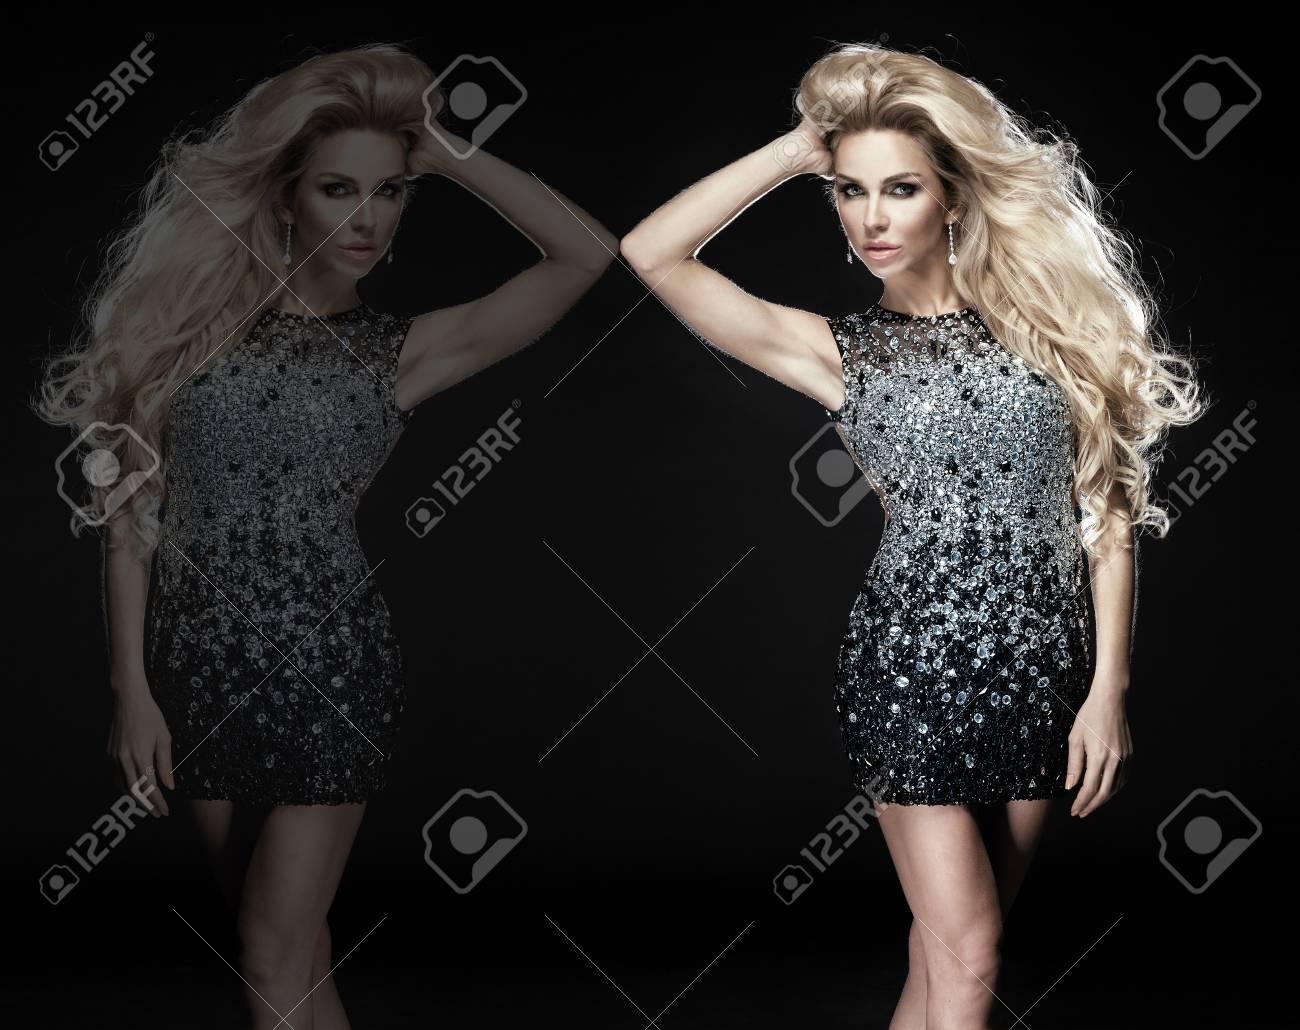 Fashionable young blonde sensual woman posing in elegant diamond dress. Long curly hair. Stock Photo - 19476094